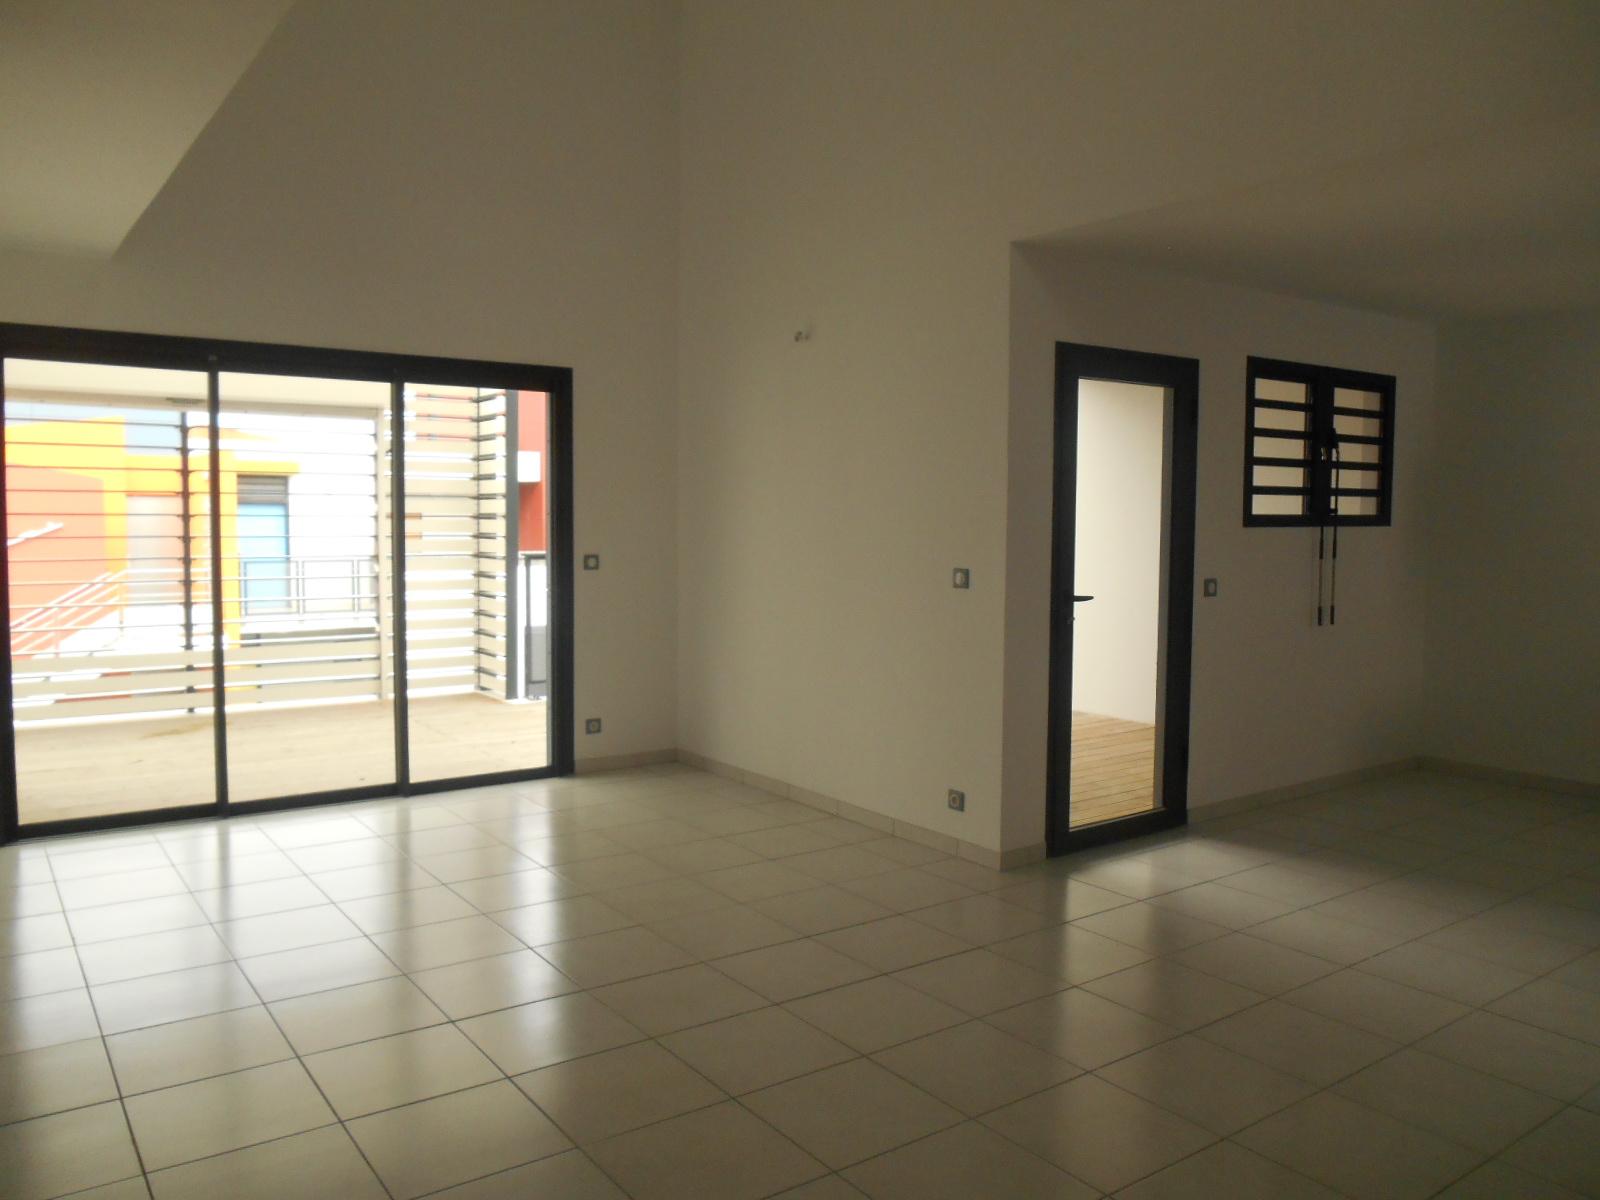 Location appartement t4 saint pierre 97410 r union sud for Achat location appartement